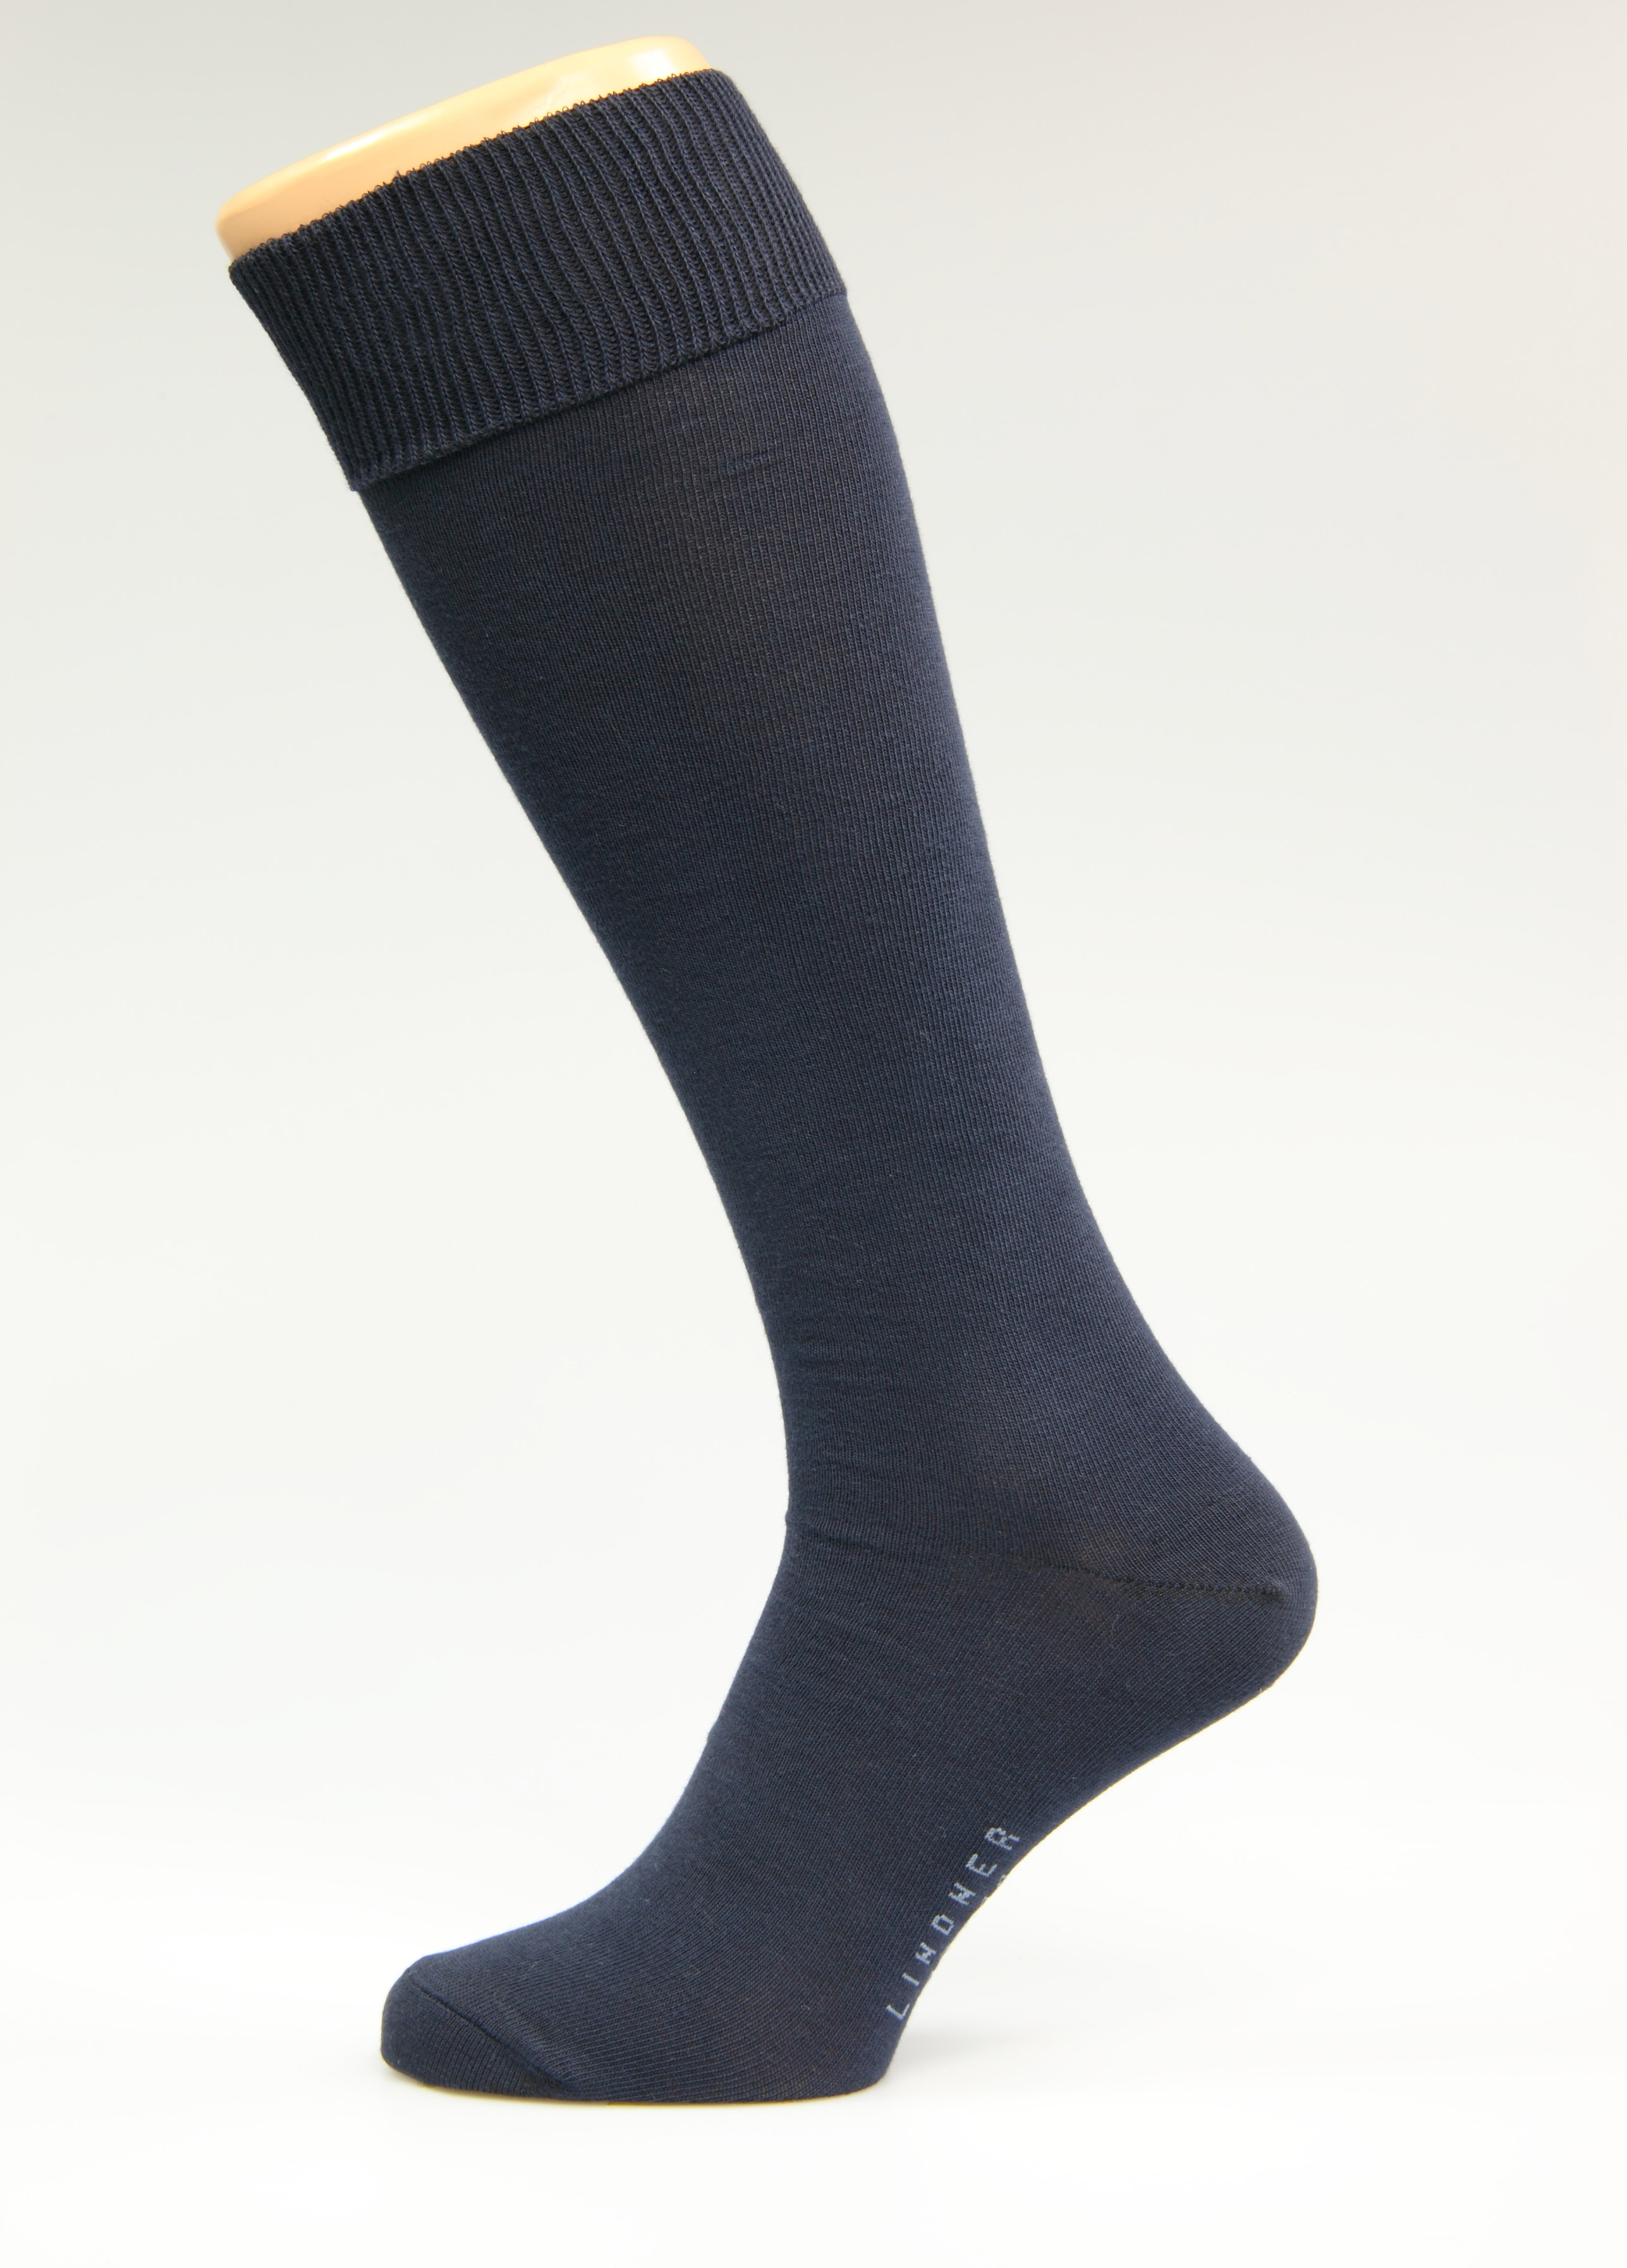 dunkelblaue-Kniestr-mpfe-Gr-sse-31-34